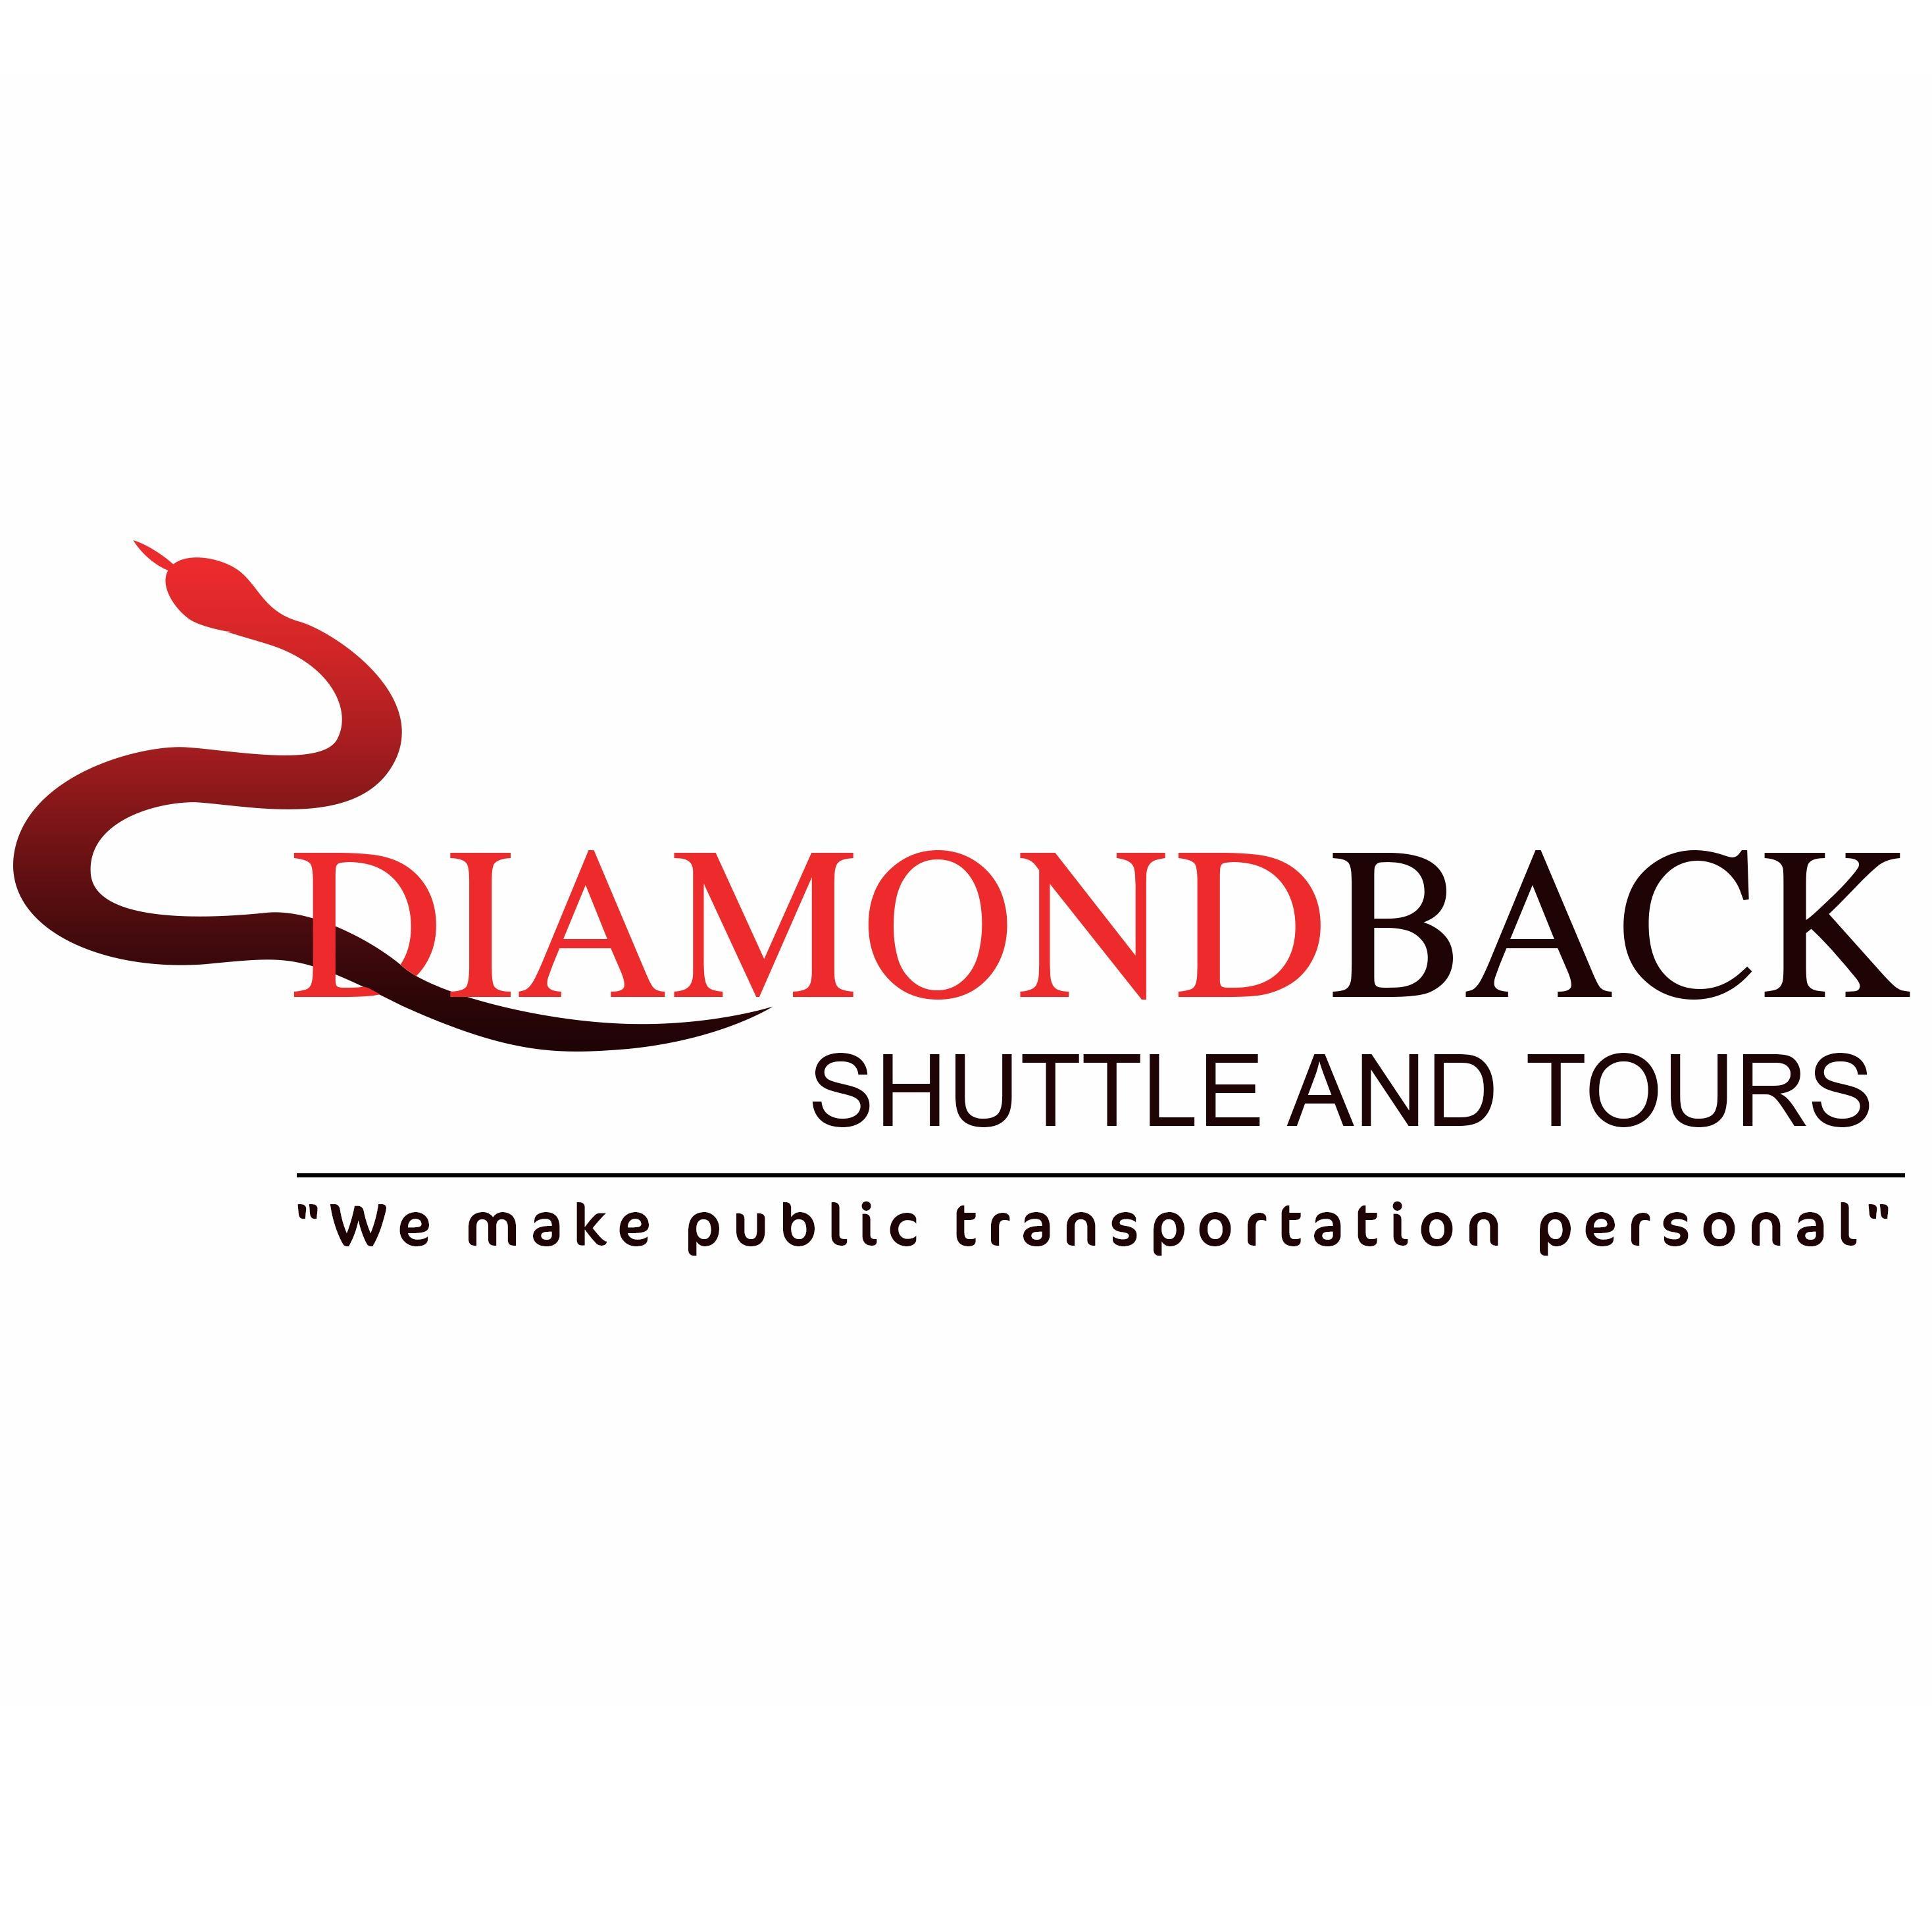 Diamondback coupon code